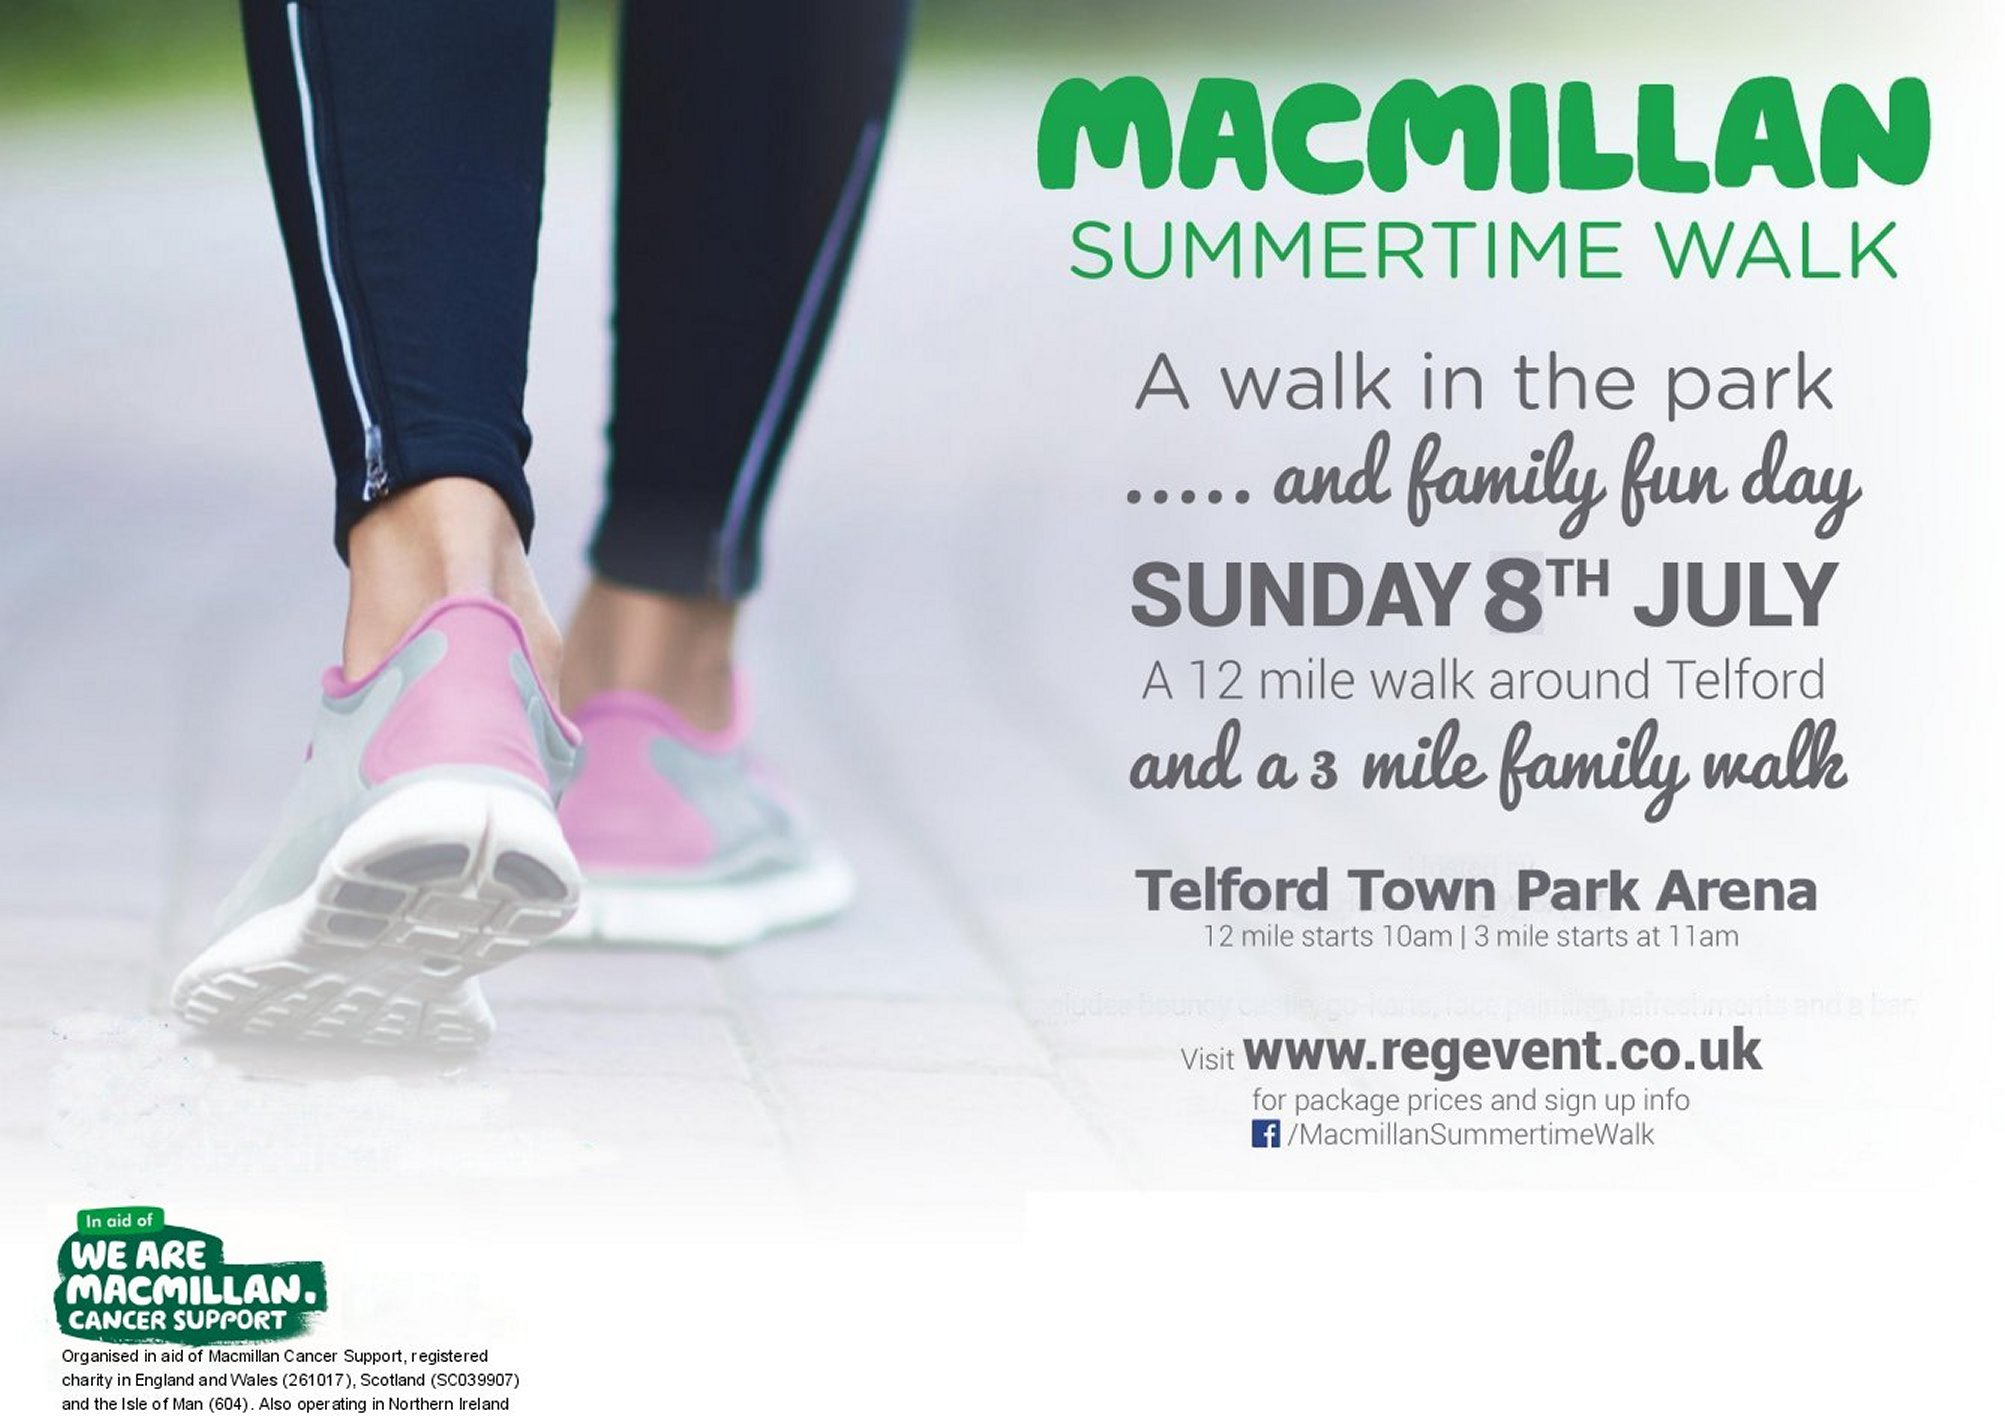 Macmillan Summertime Walk